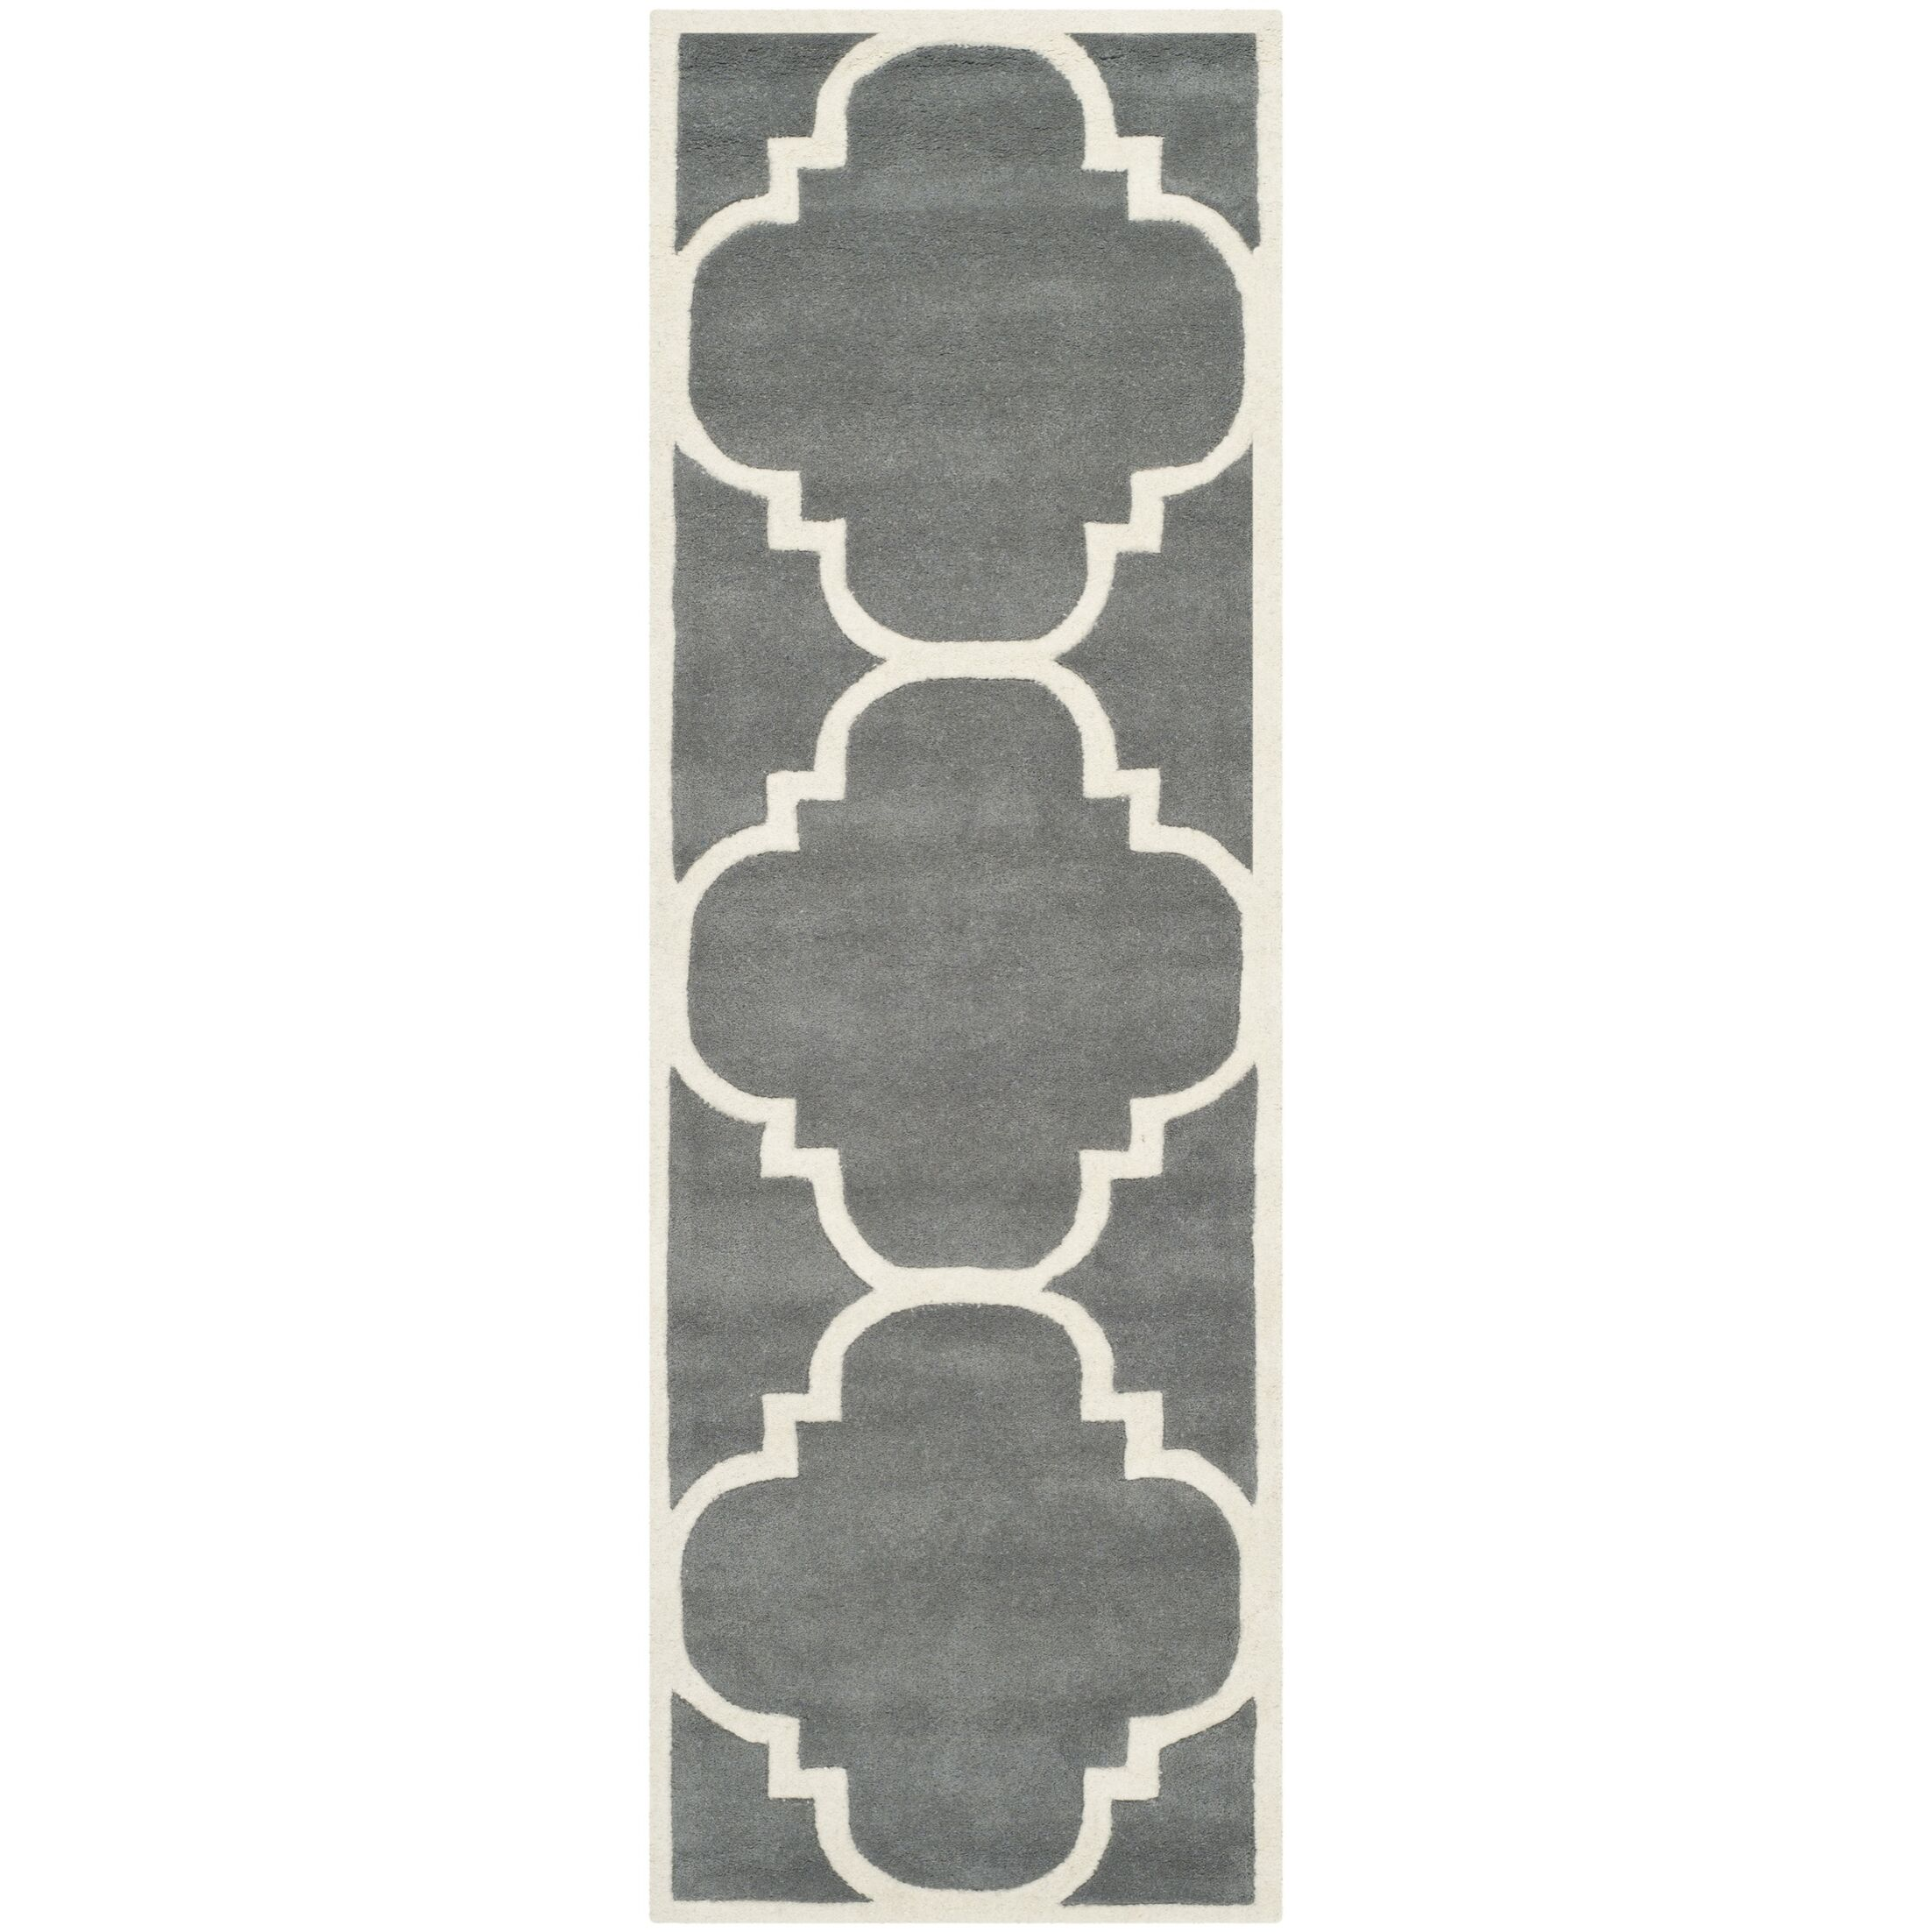 Wilkin Hand-Tufted Wool Dark Gray Area Rug Rug Size: Runner 2'3